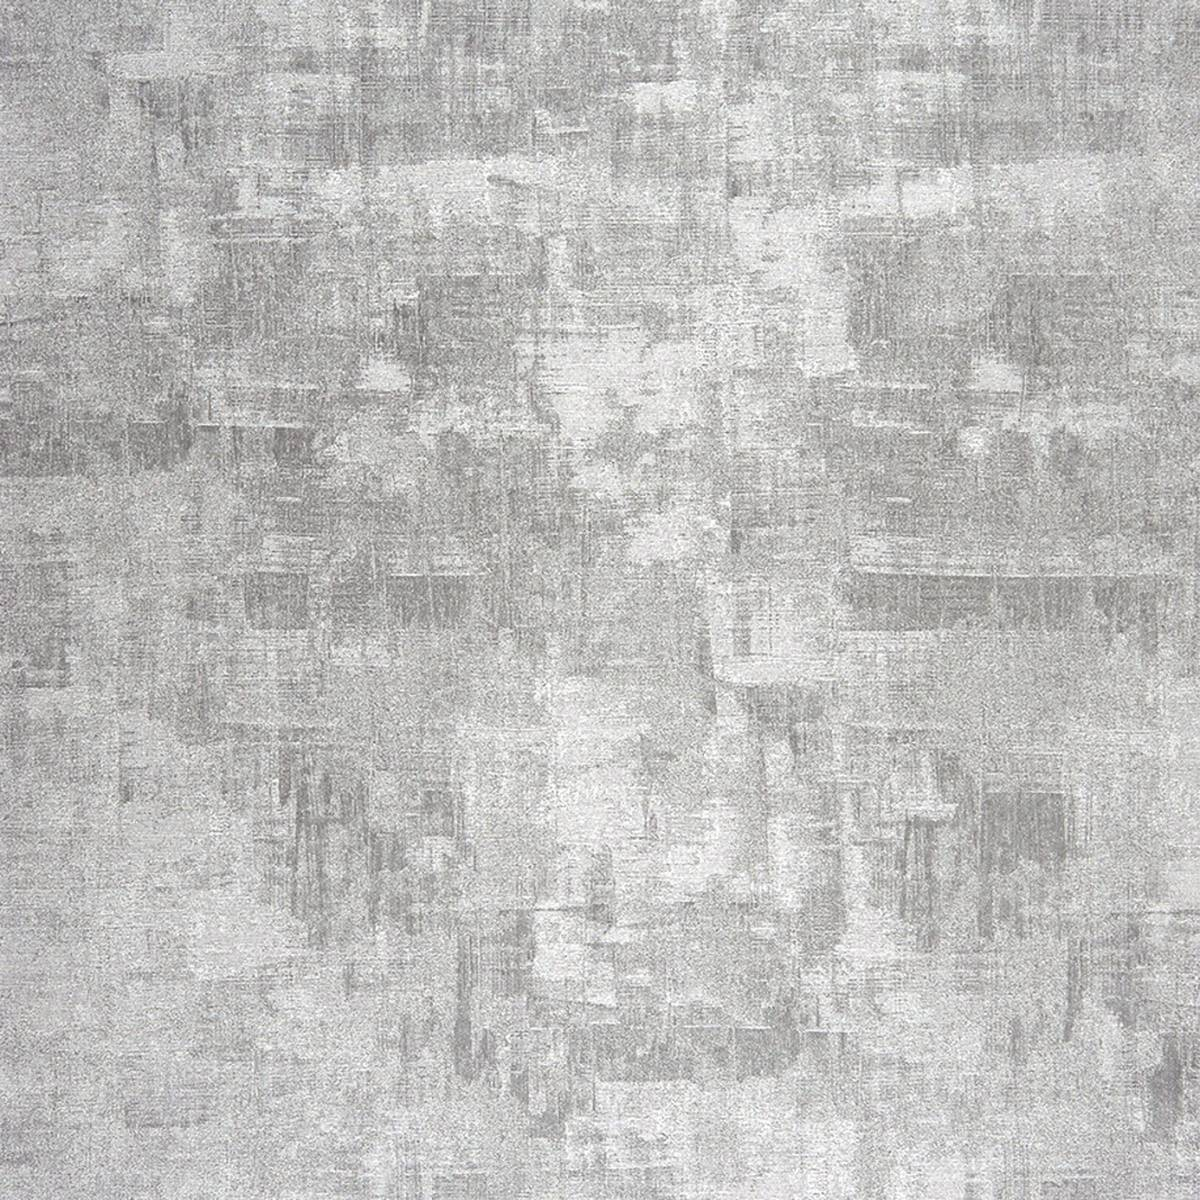 uni wallpaper silver grey 26379137 casadeco majestic. Black Bedroom Furniture Sets. Home Design Ideas